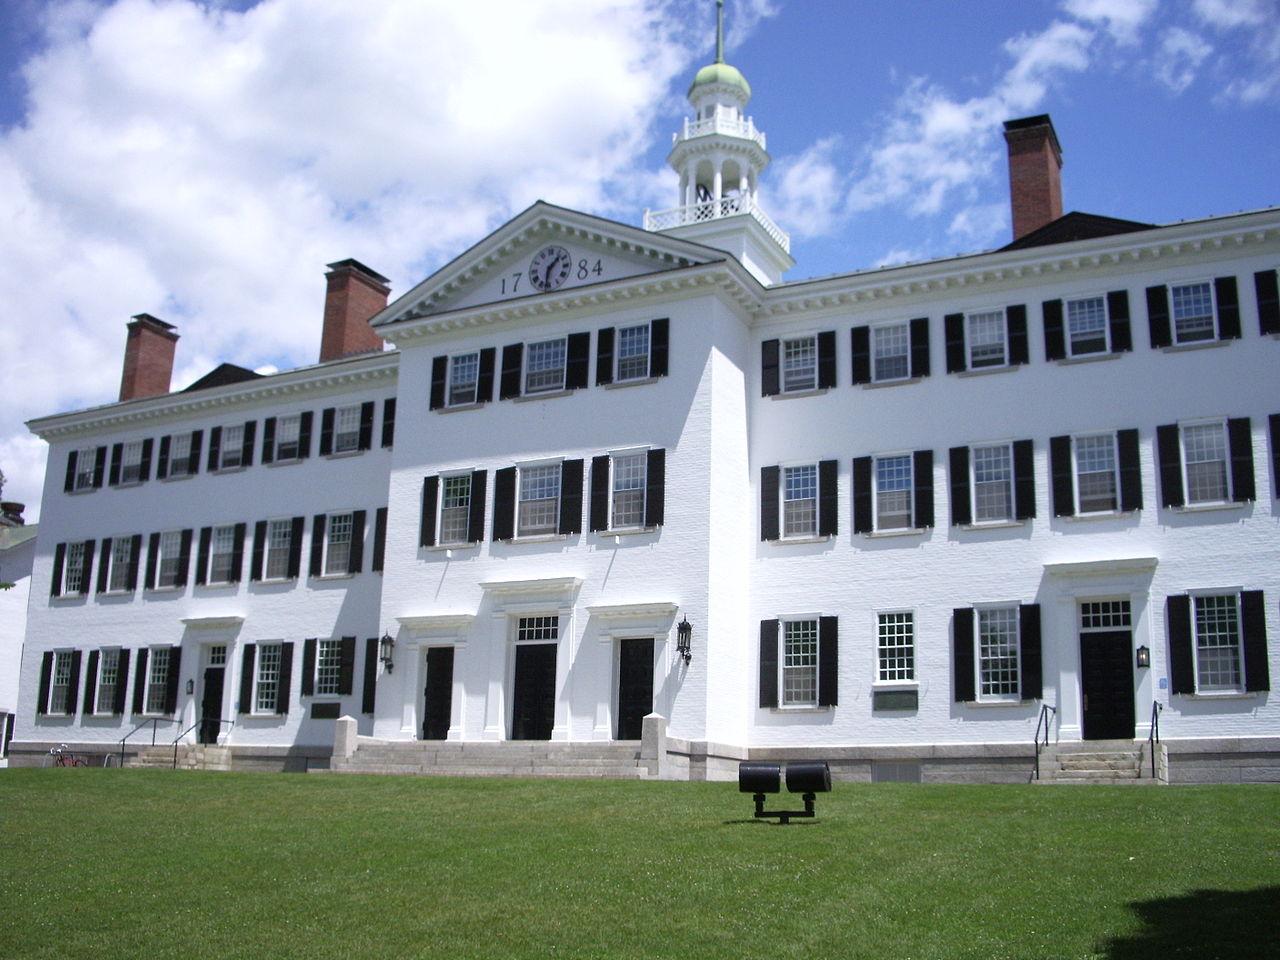 essay - Macaulay Honors College